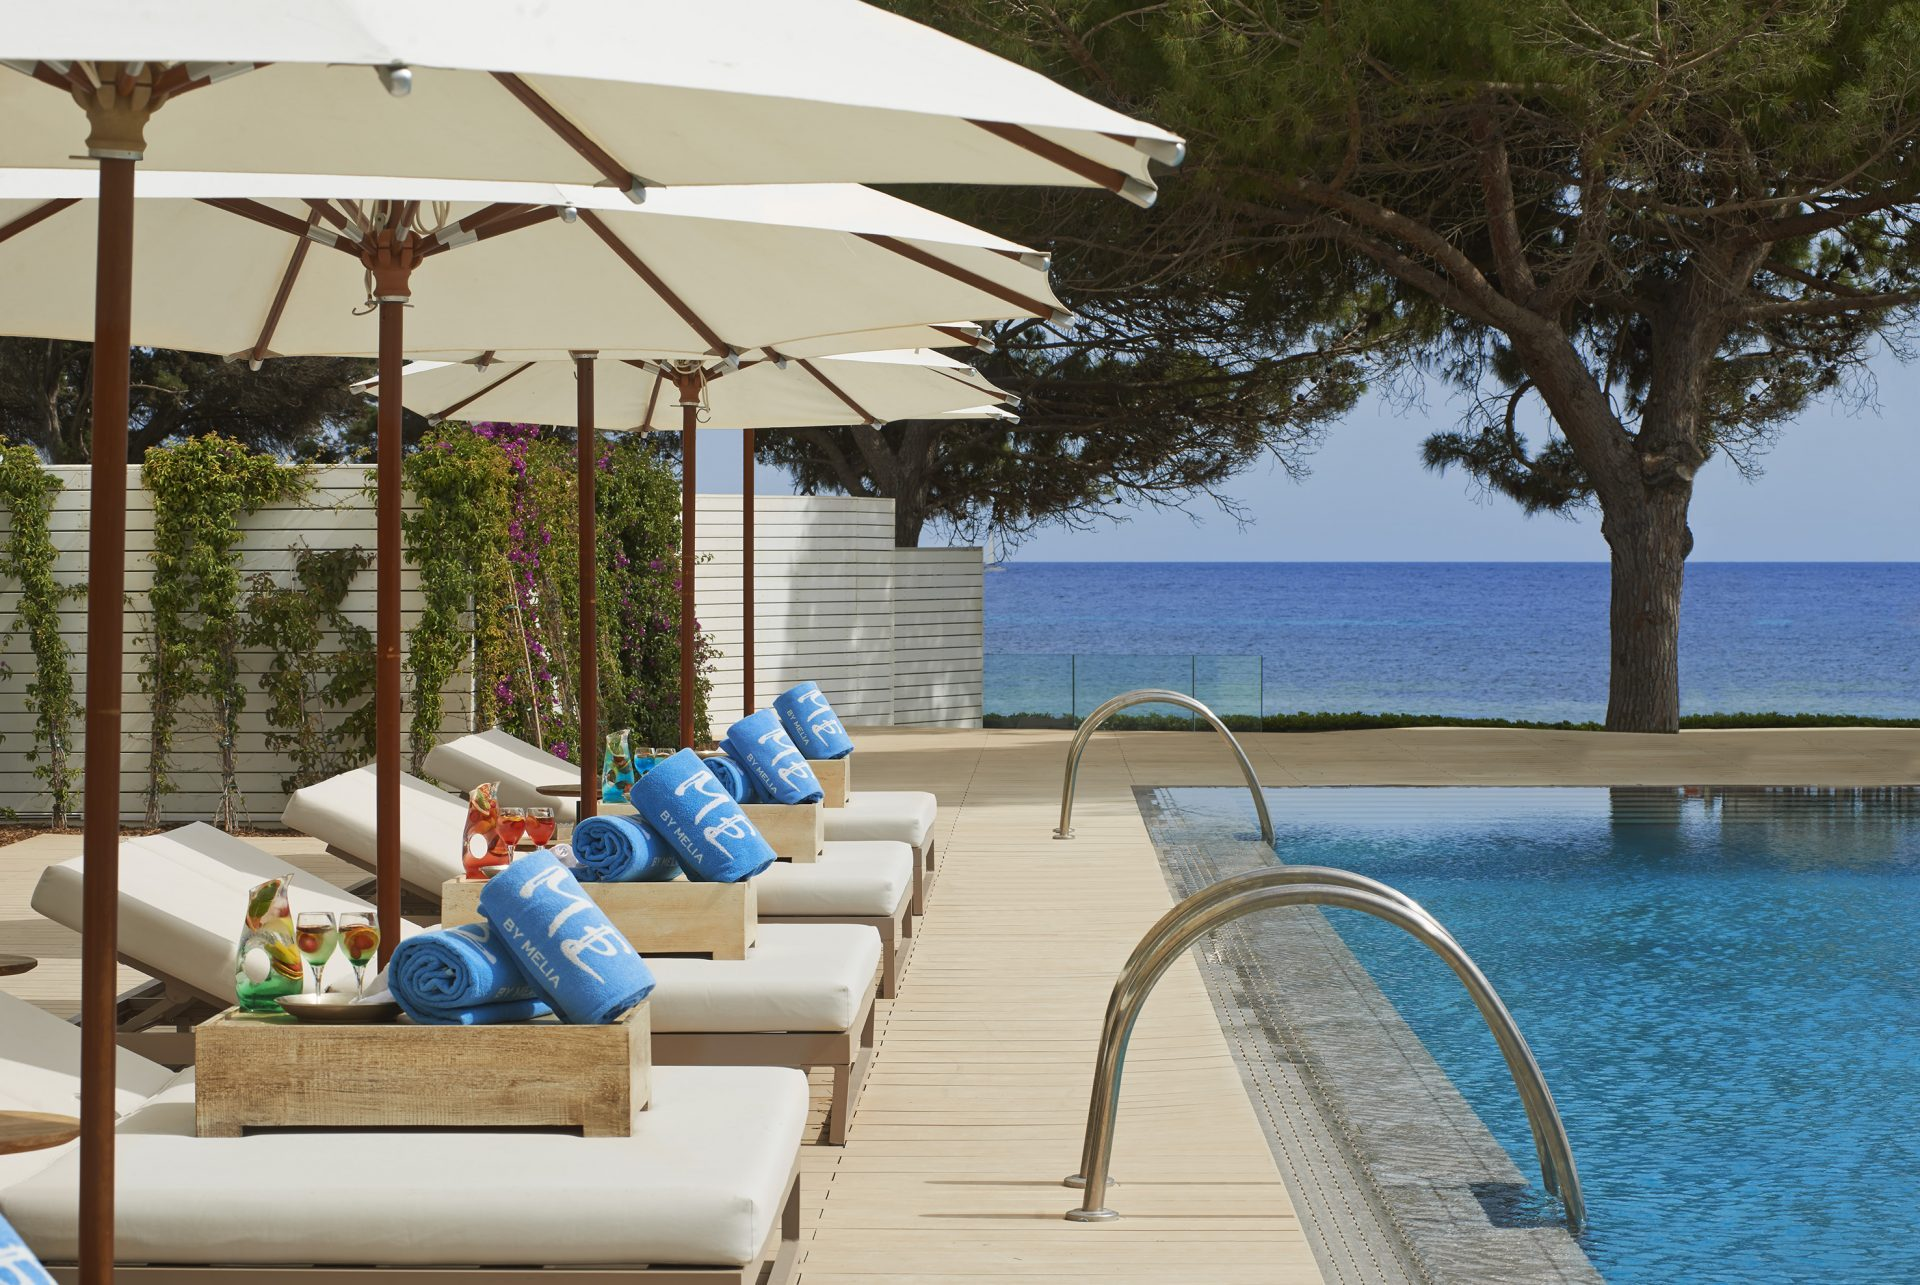 302ME Ibiza Pool